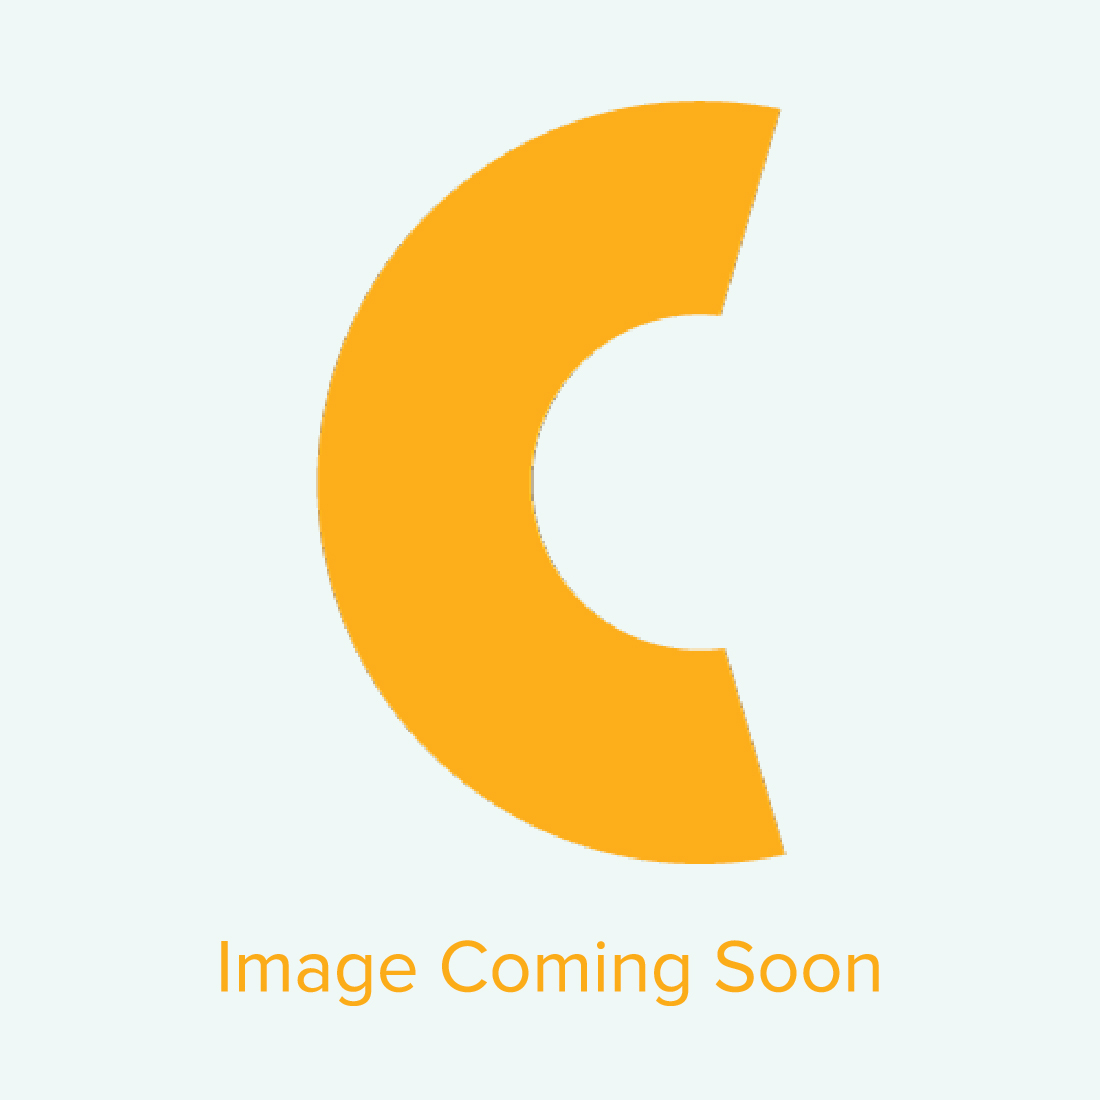 "Hotronix STX6 Auto Opening Digital Cap Heat Press Machine - 6"" x 6"""